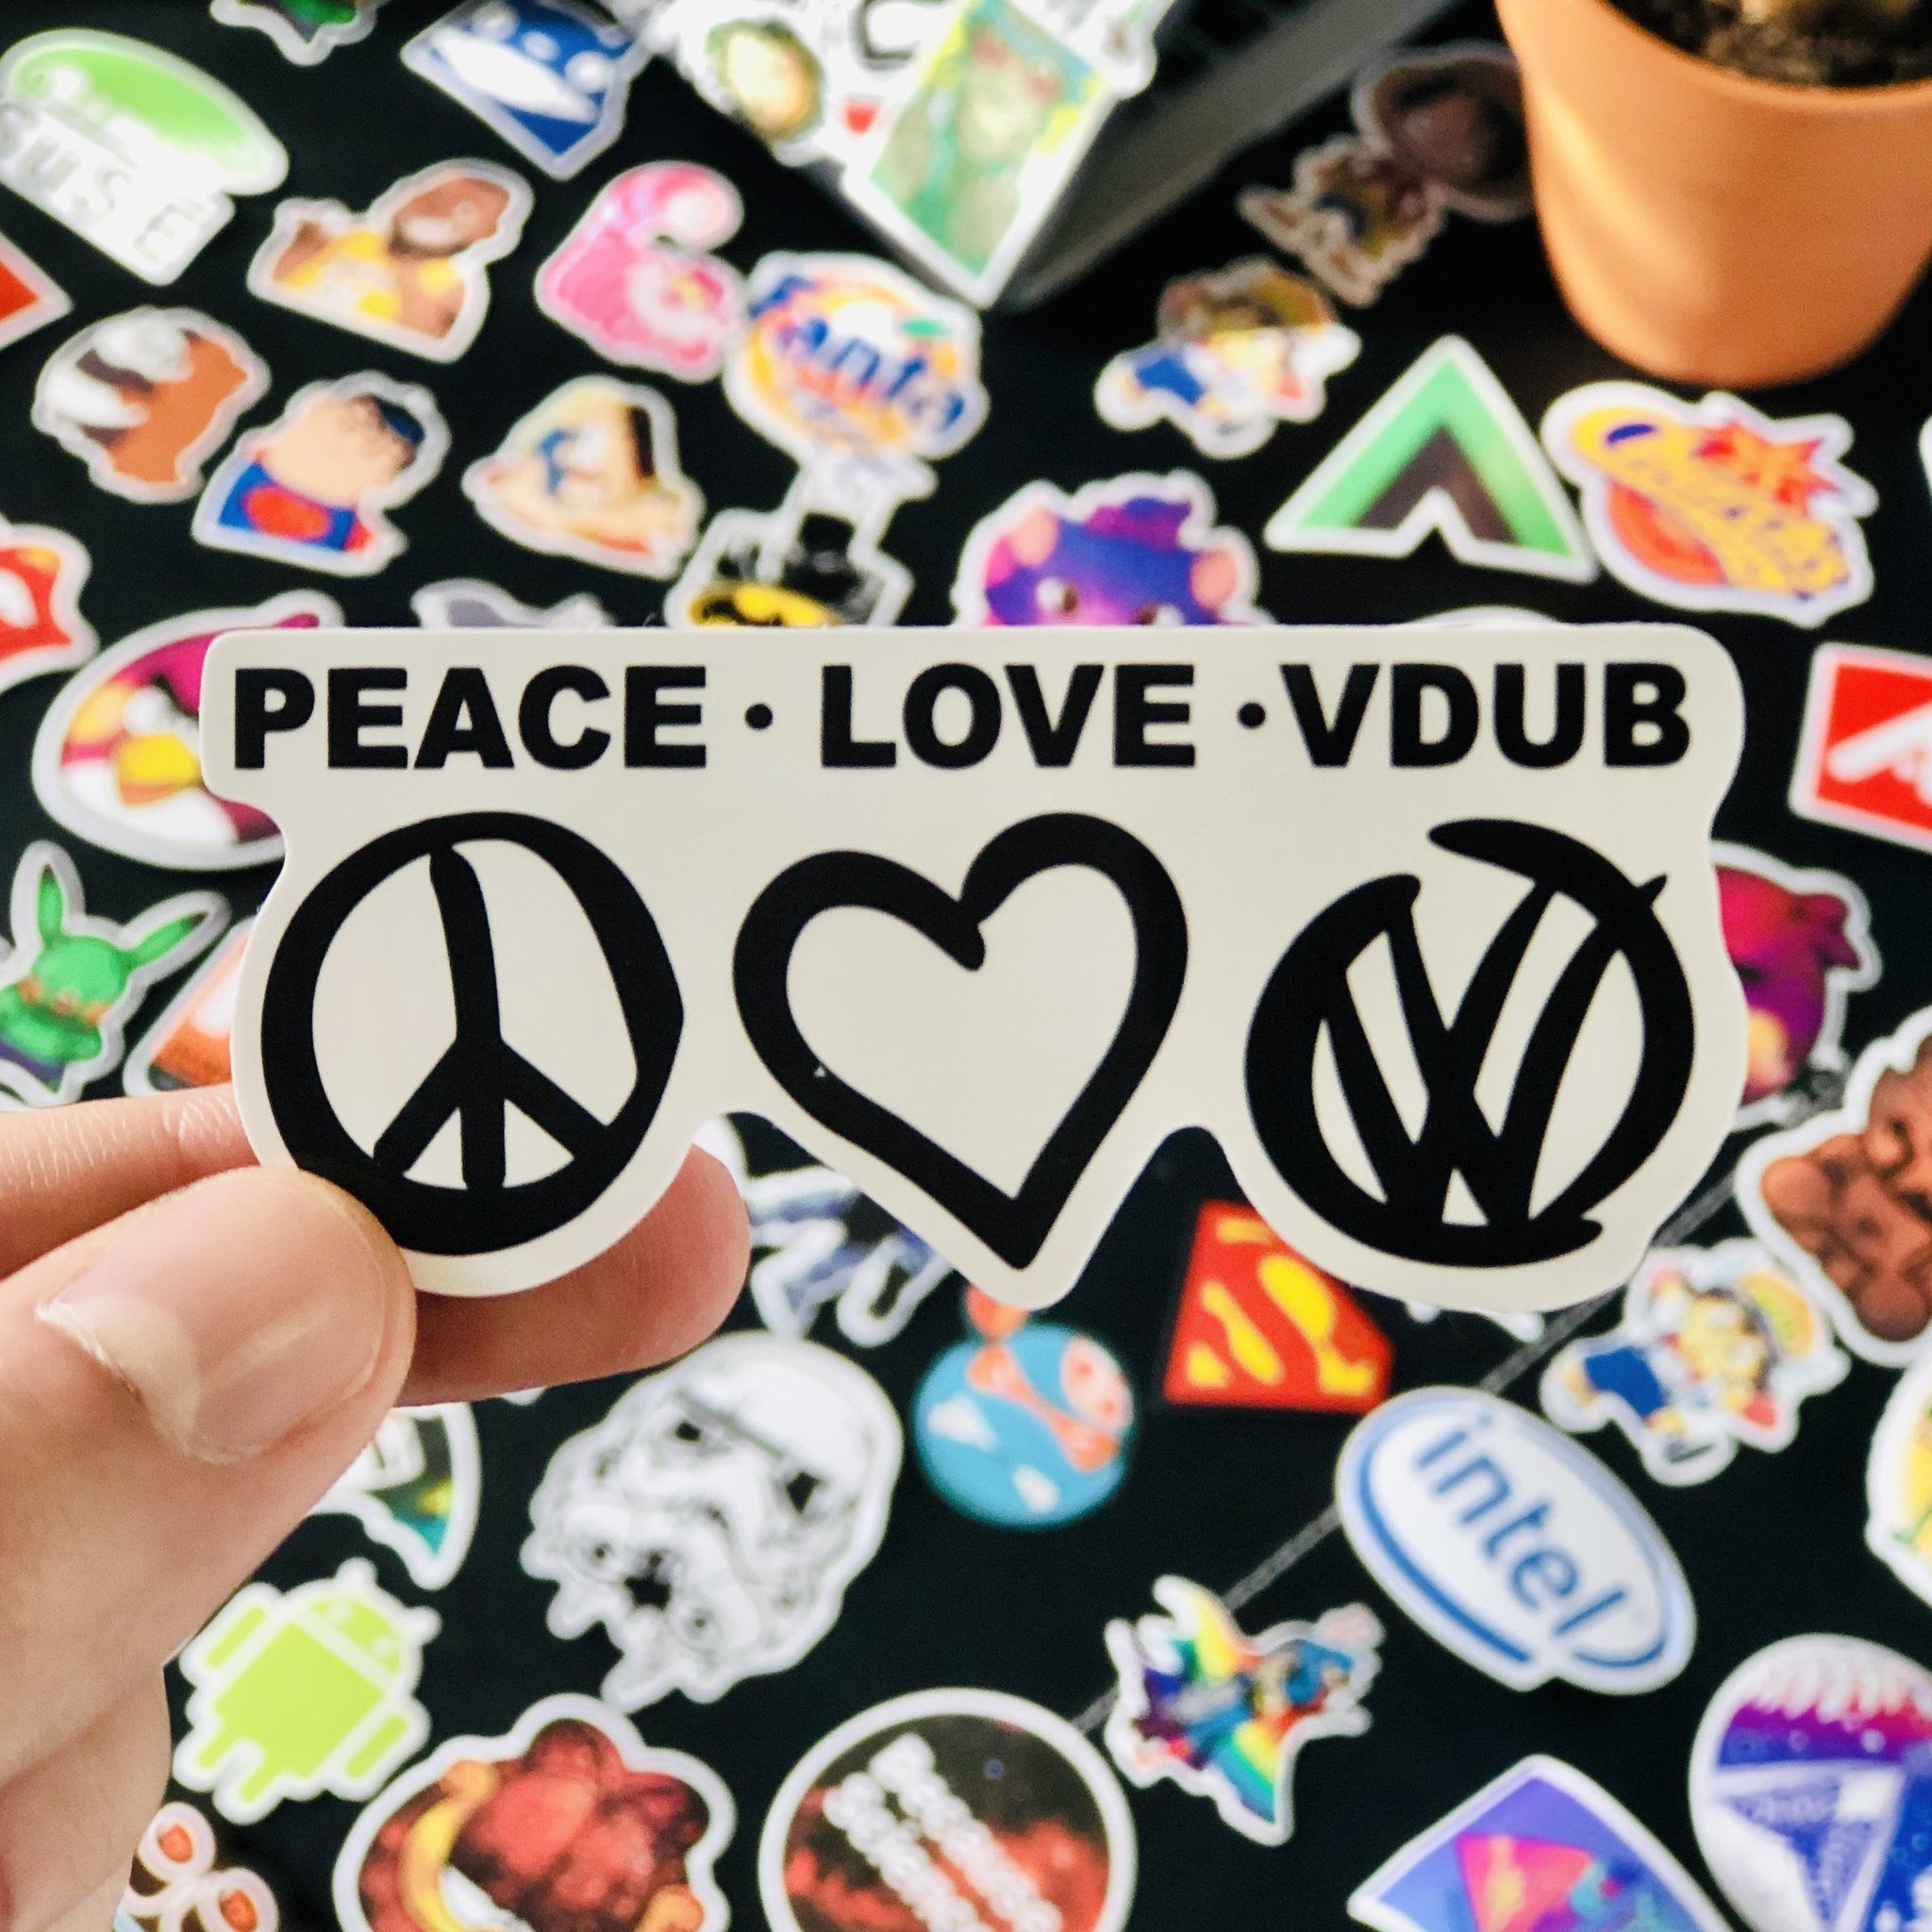 Peace Love Vdub Vw Sticker Car Window Stickers Sticker Shop Peace And Love [ 2048 x 2048 Pixel ]